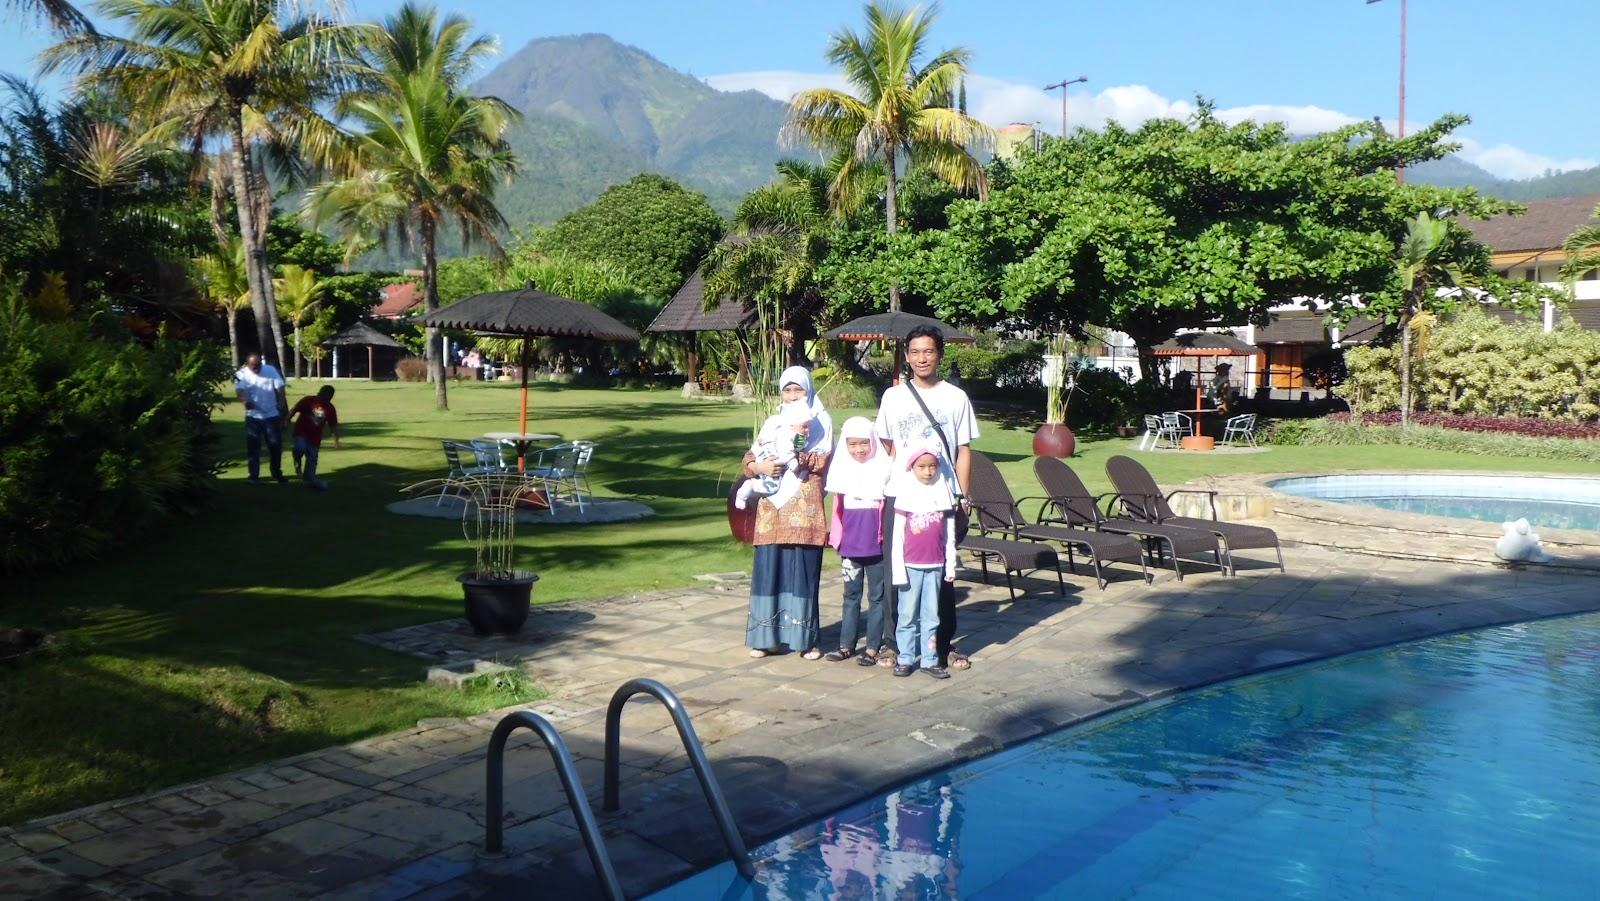 Hari Ketiga Paginya Kita Hanya Menghabiskan Waktu Di Hotel Sebenarnya Pemandangan Cukup Bagus Dengan Latar Belakang Gunung Arjuno